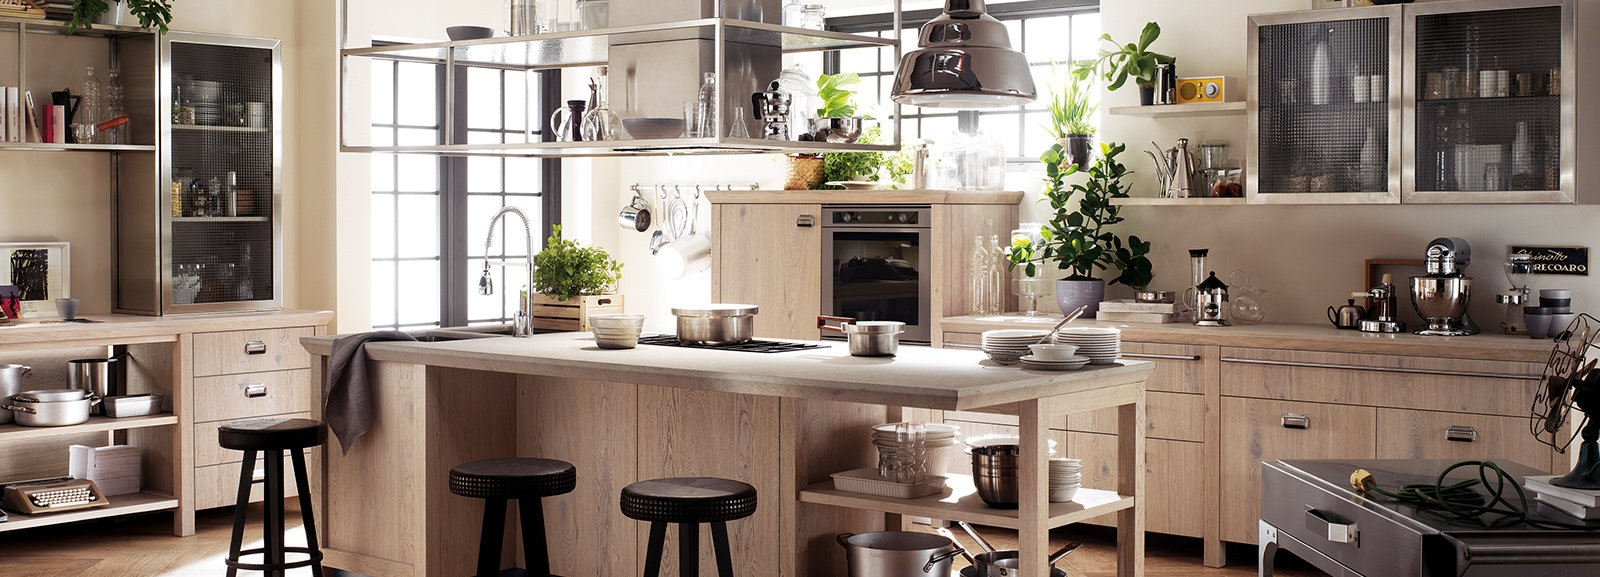 Cucine moderne in legno cose di casa for Case americane arredamento